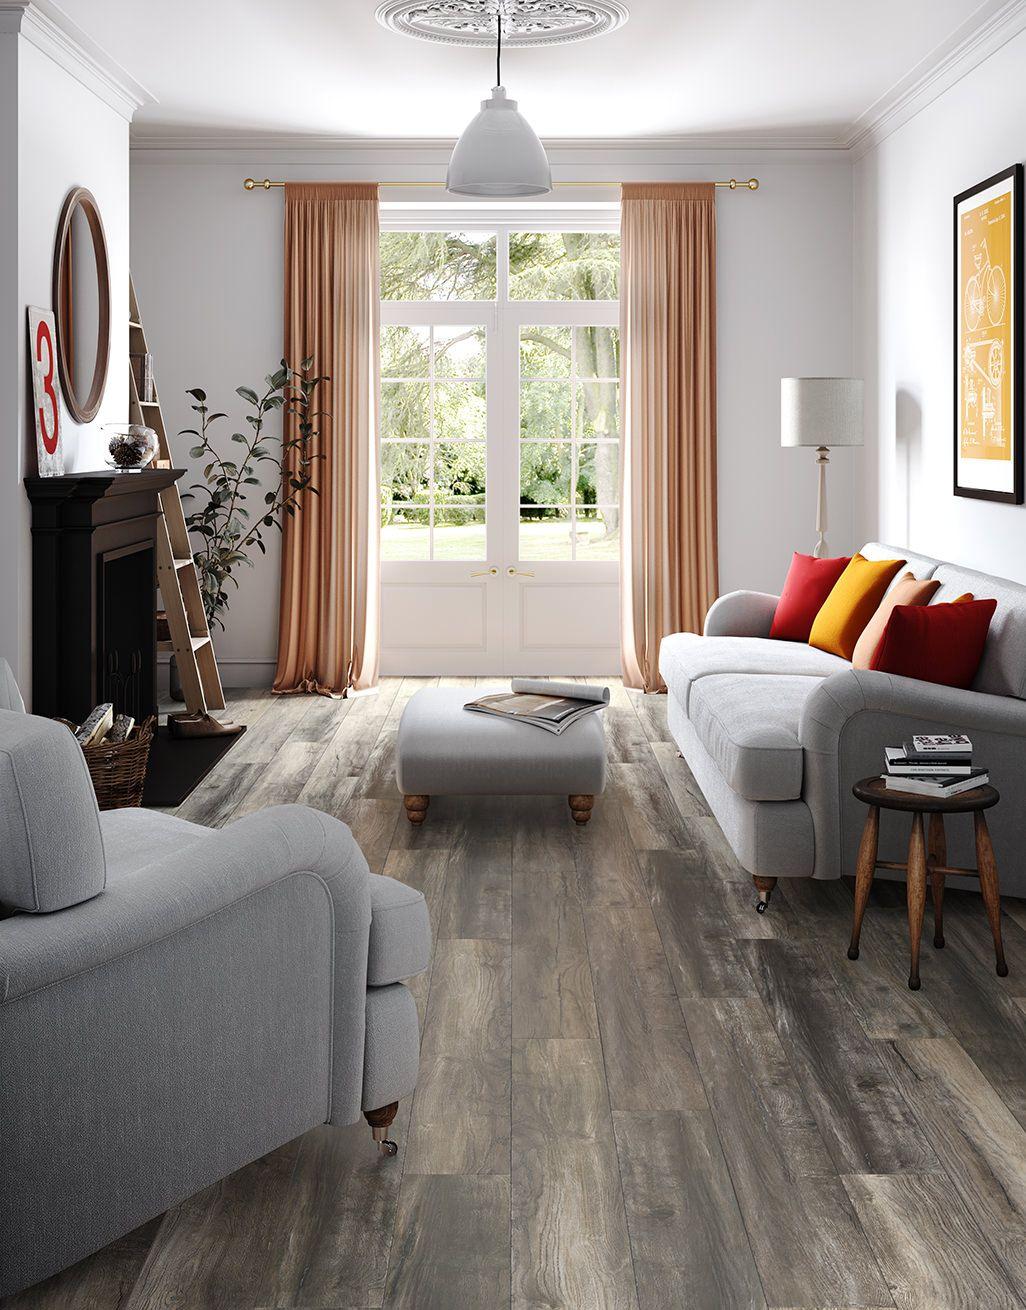 Harbour Oak Grey Laminate Flooring, New Haven Harbor Oak Laminate Flooring